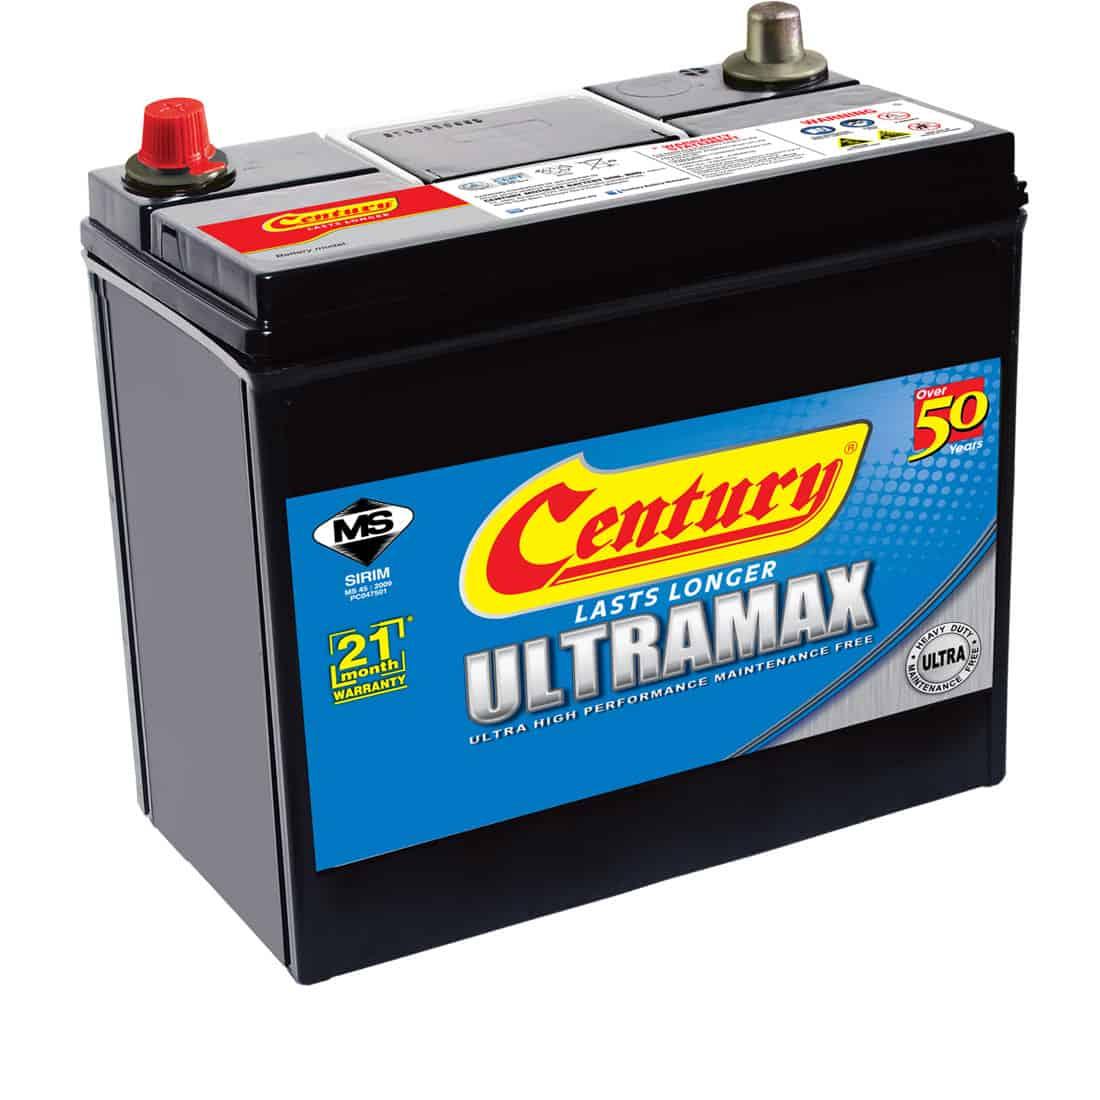 Century Ultramax Battery